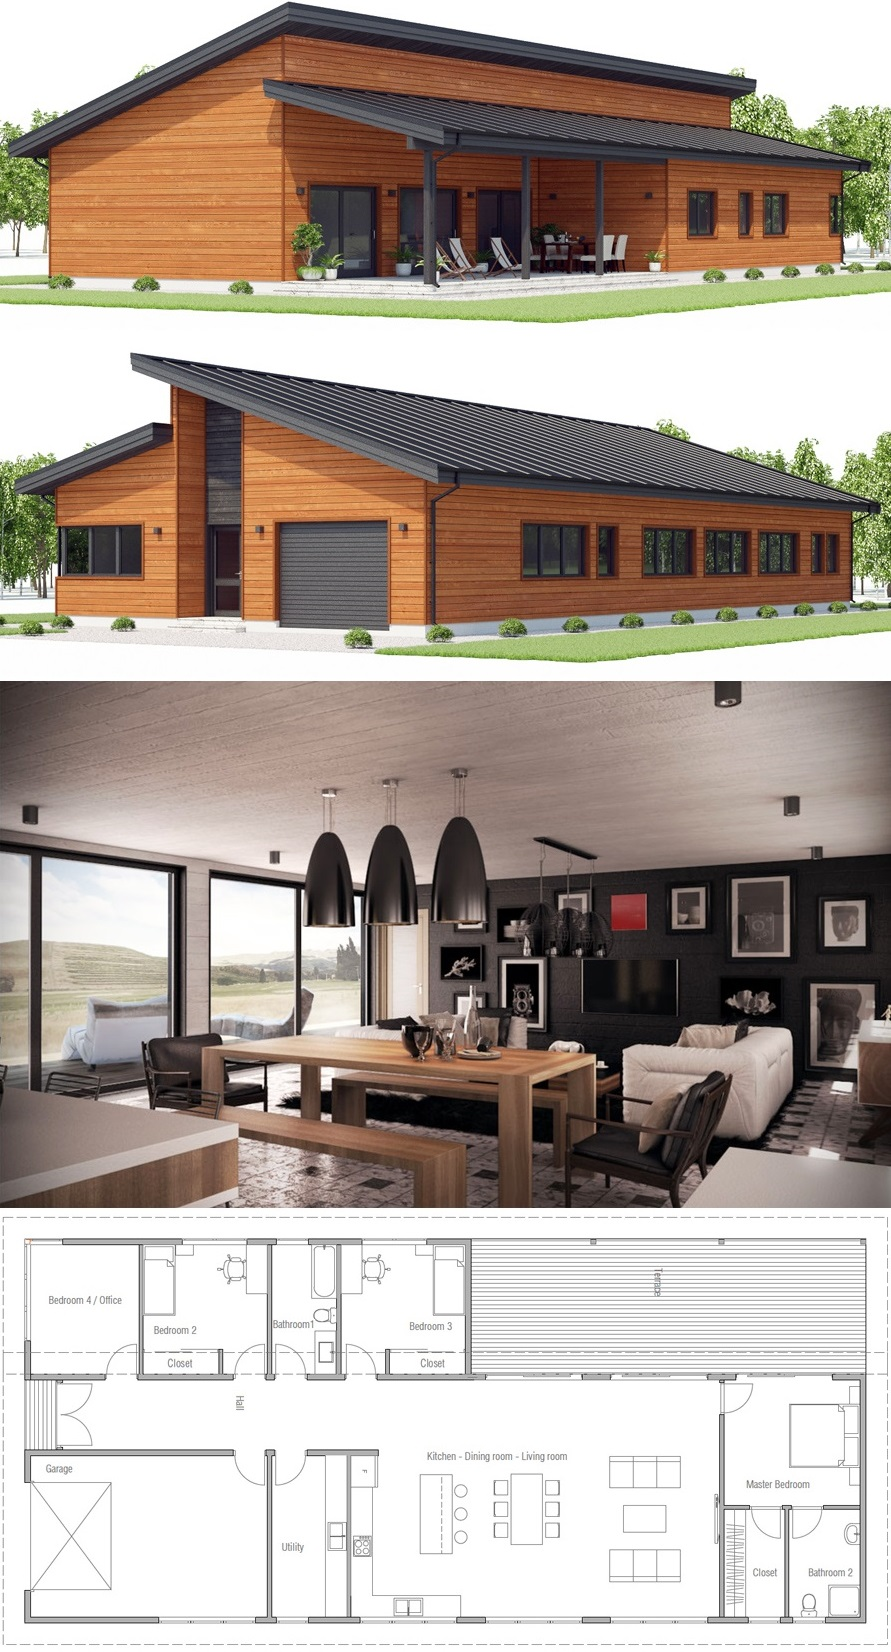 House Design Ch527 House Designs Exterior House Design House Plans